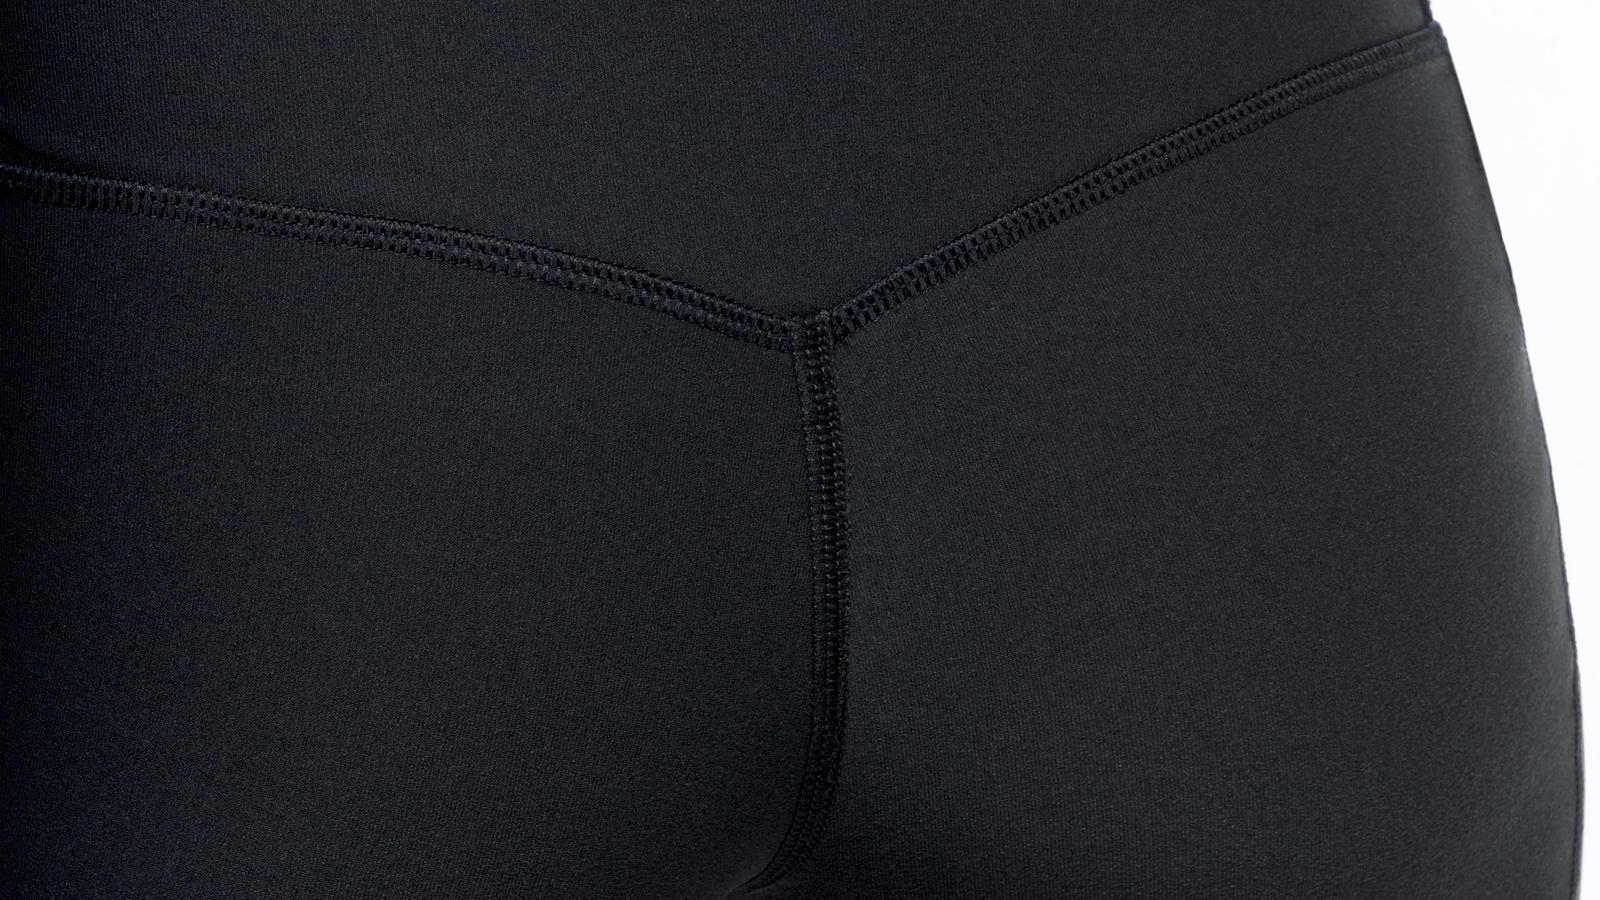 Nike_Legend_Pant_V_Seam_Detail